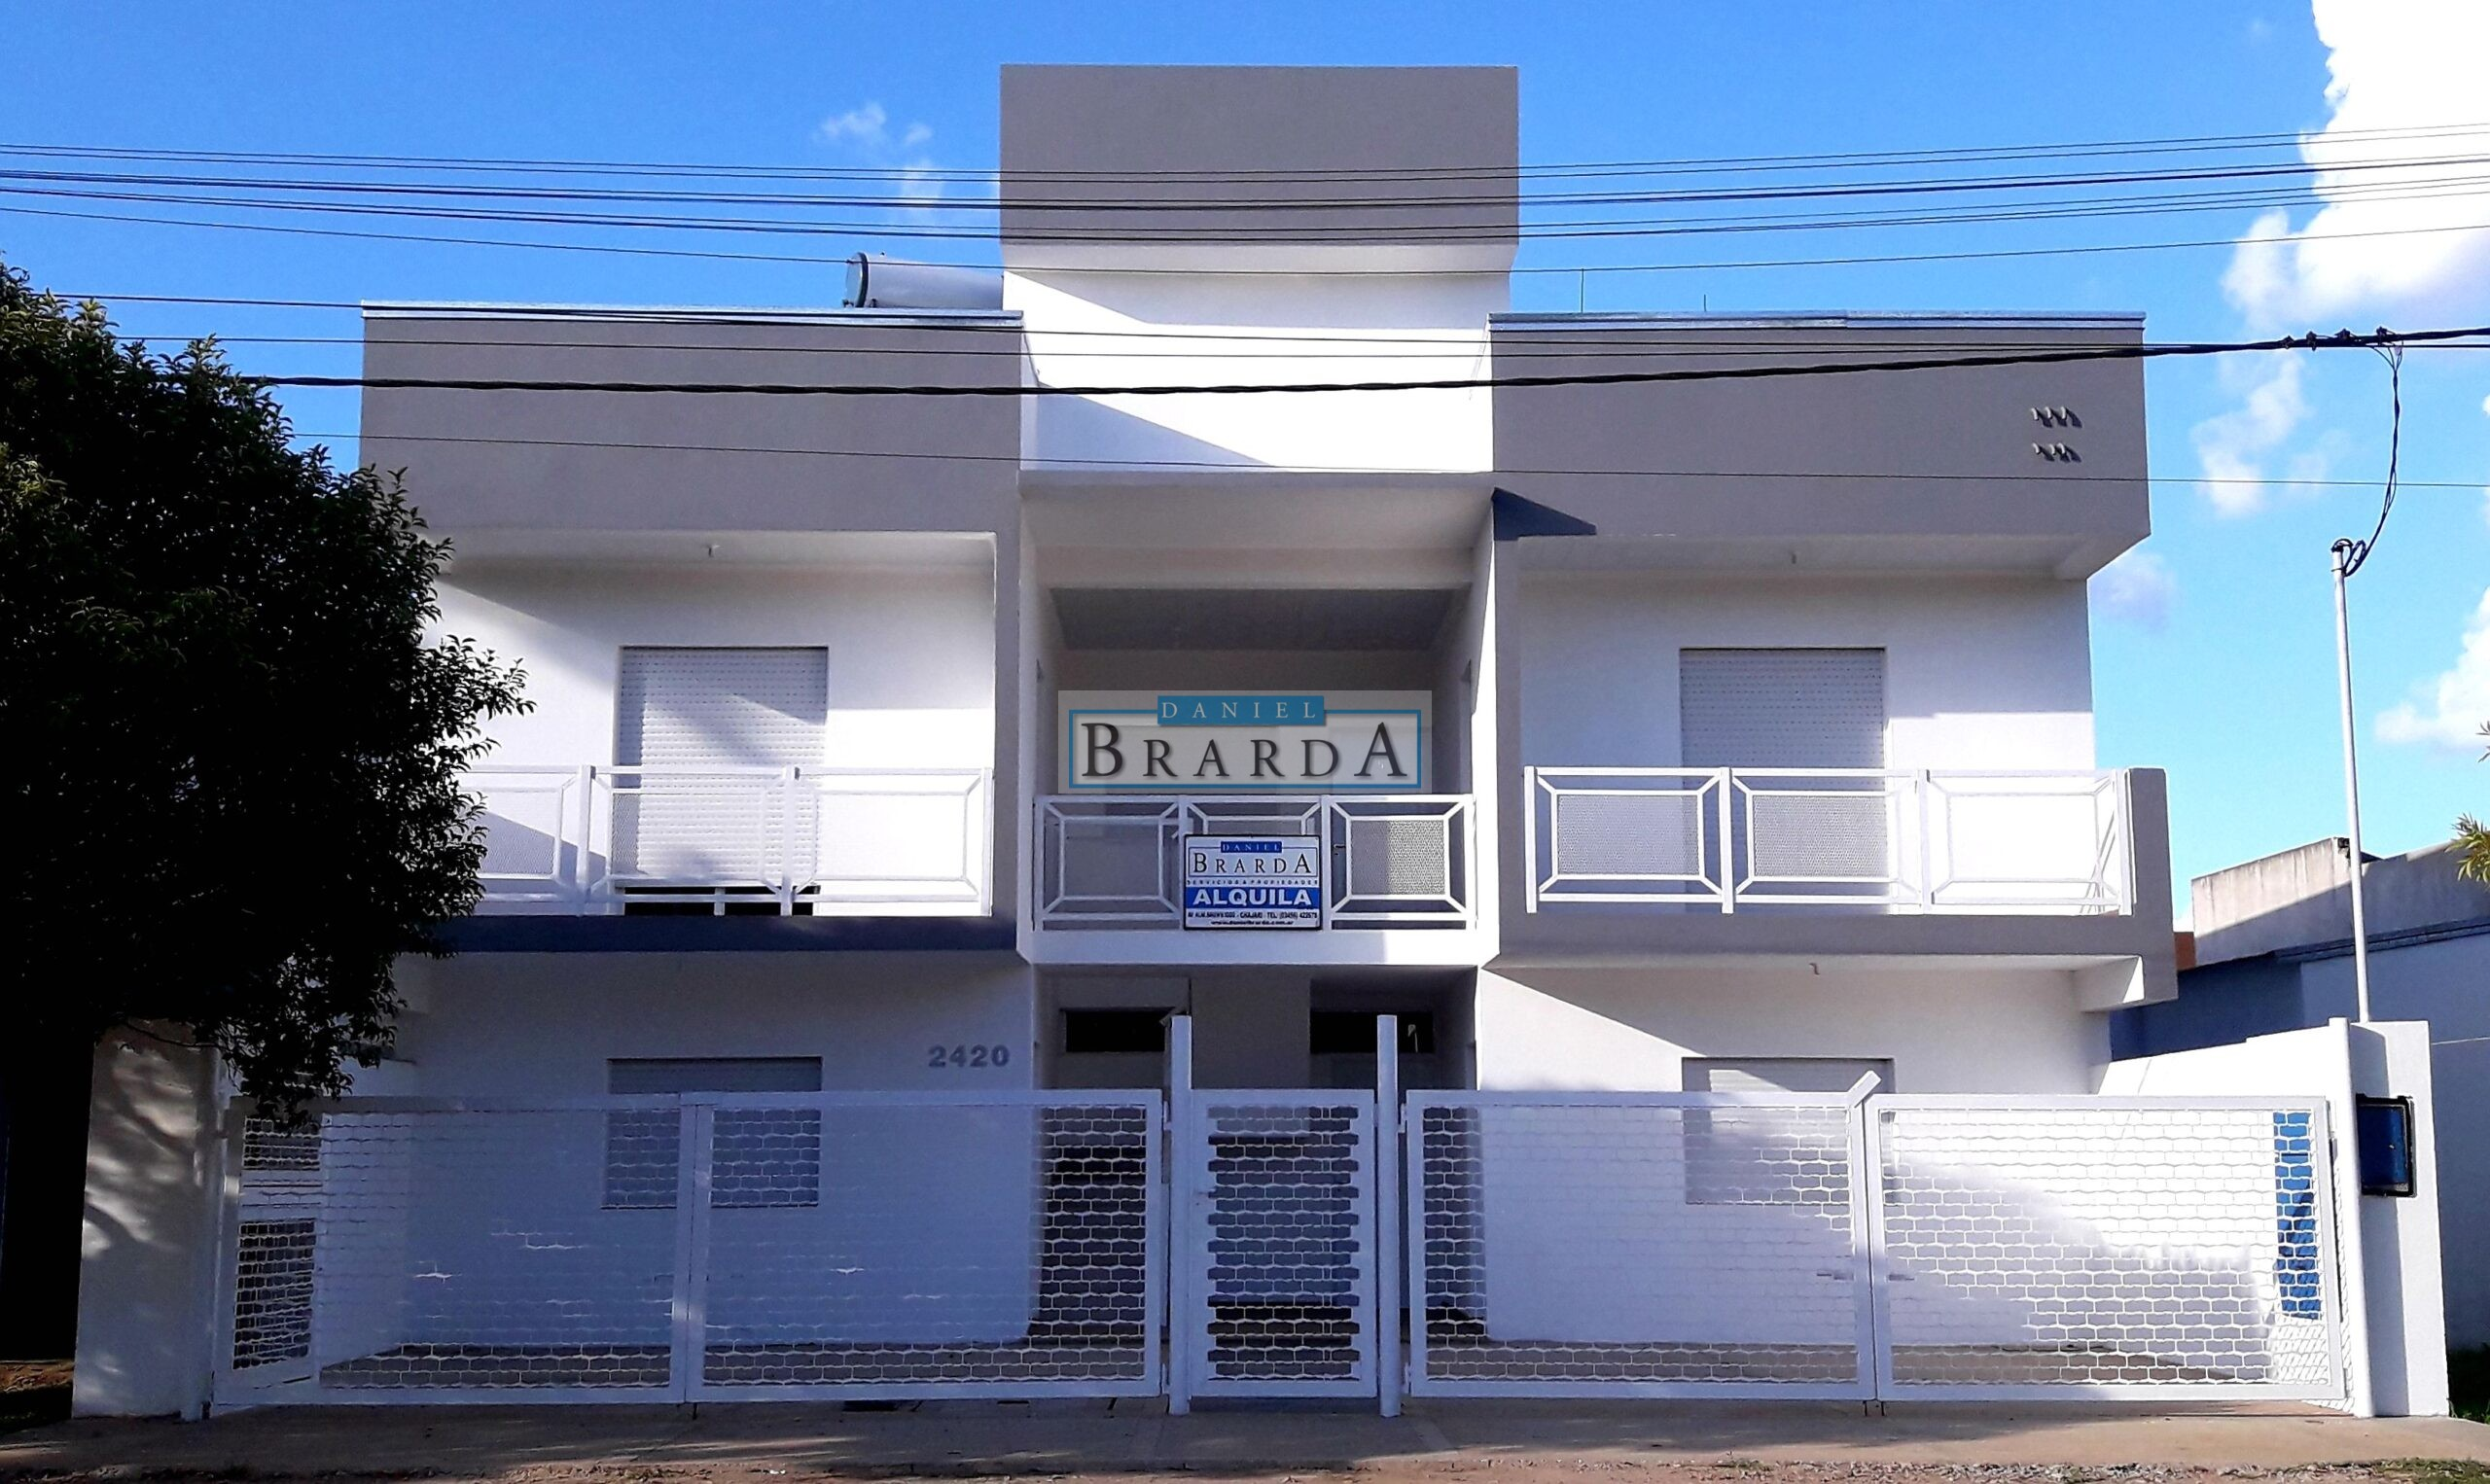 Departamento 2 (1 dormitorio) – Alte. Brown 2420 Chajari (ER)